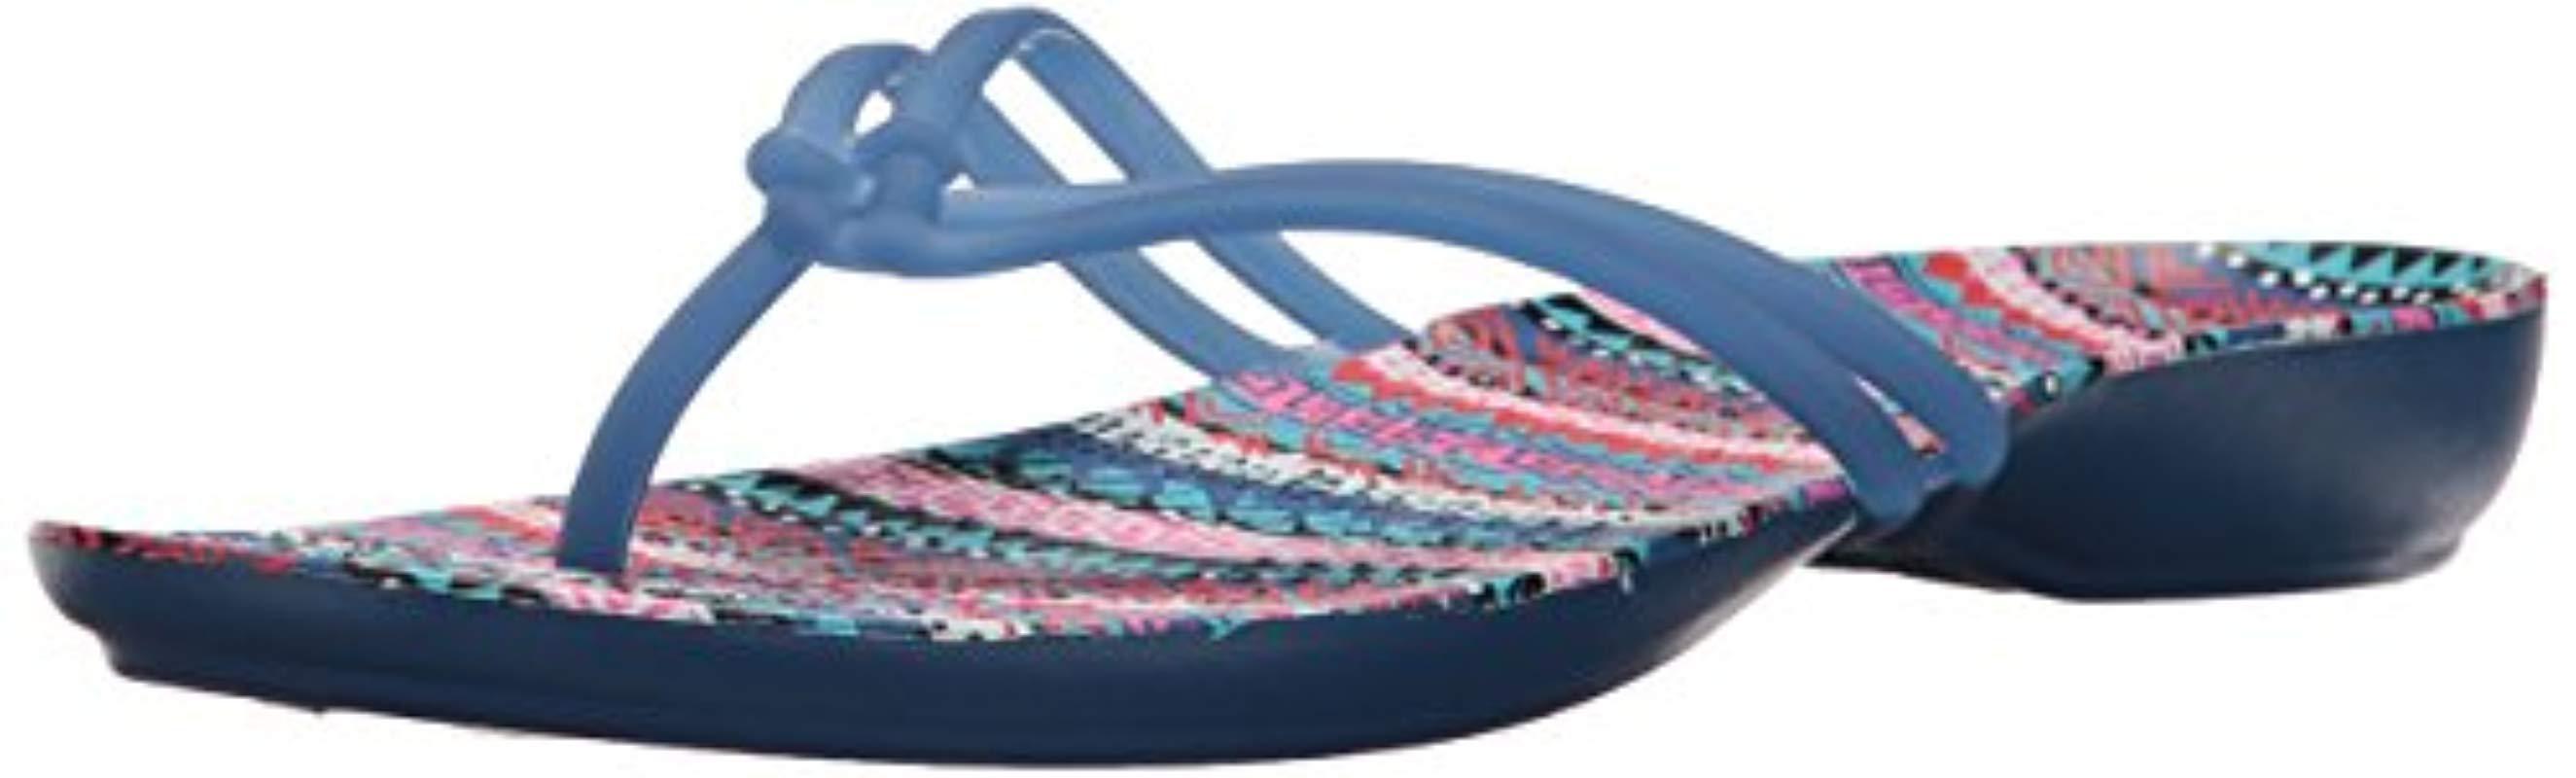 ac107b75f Lyst - Crocs™ Isabella Graphic Flip in Blue - Save 29.411764705882348%